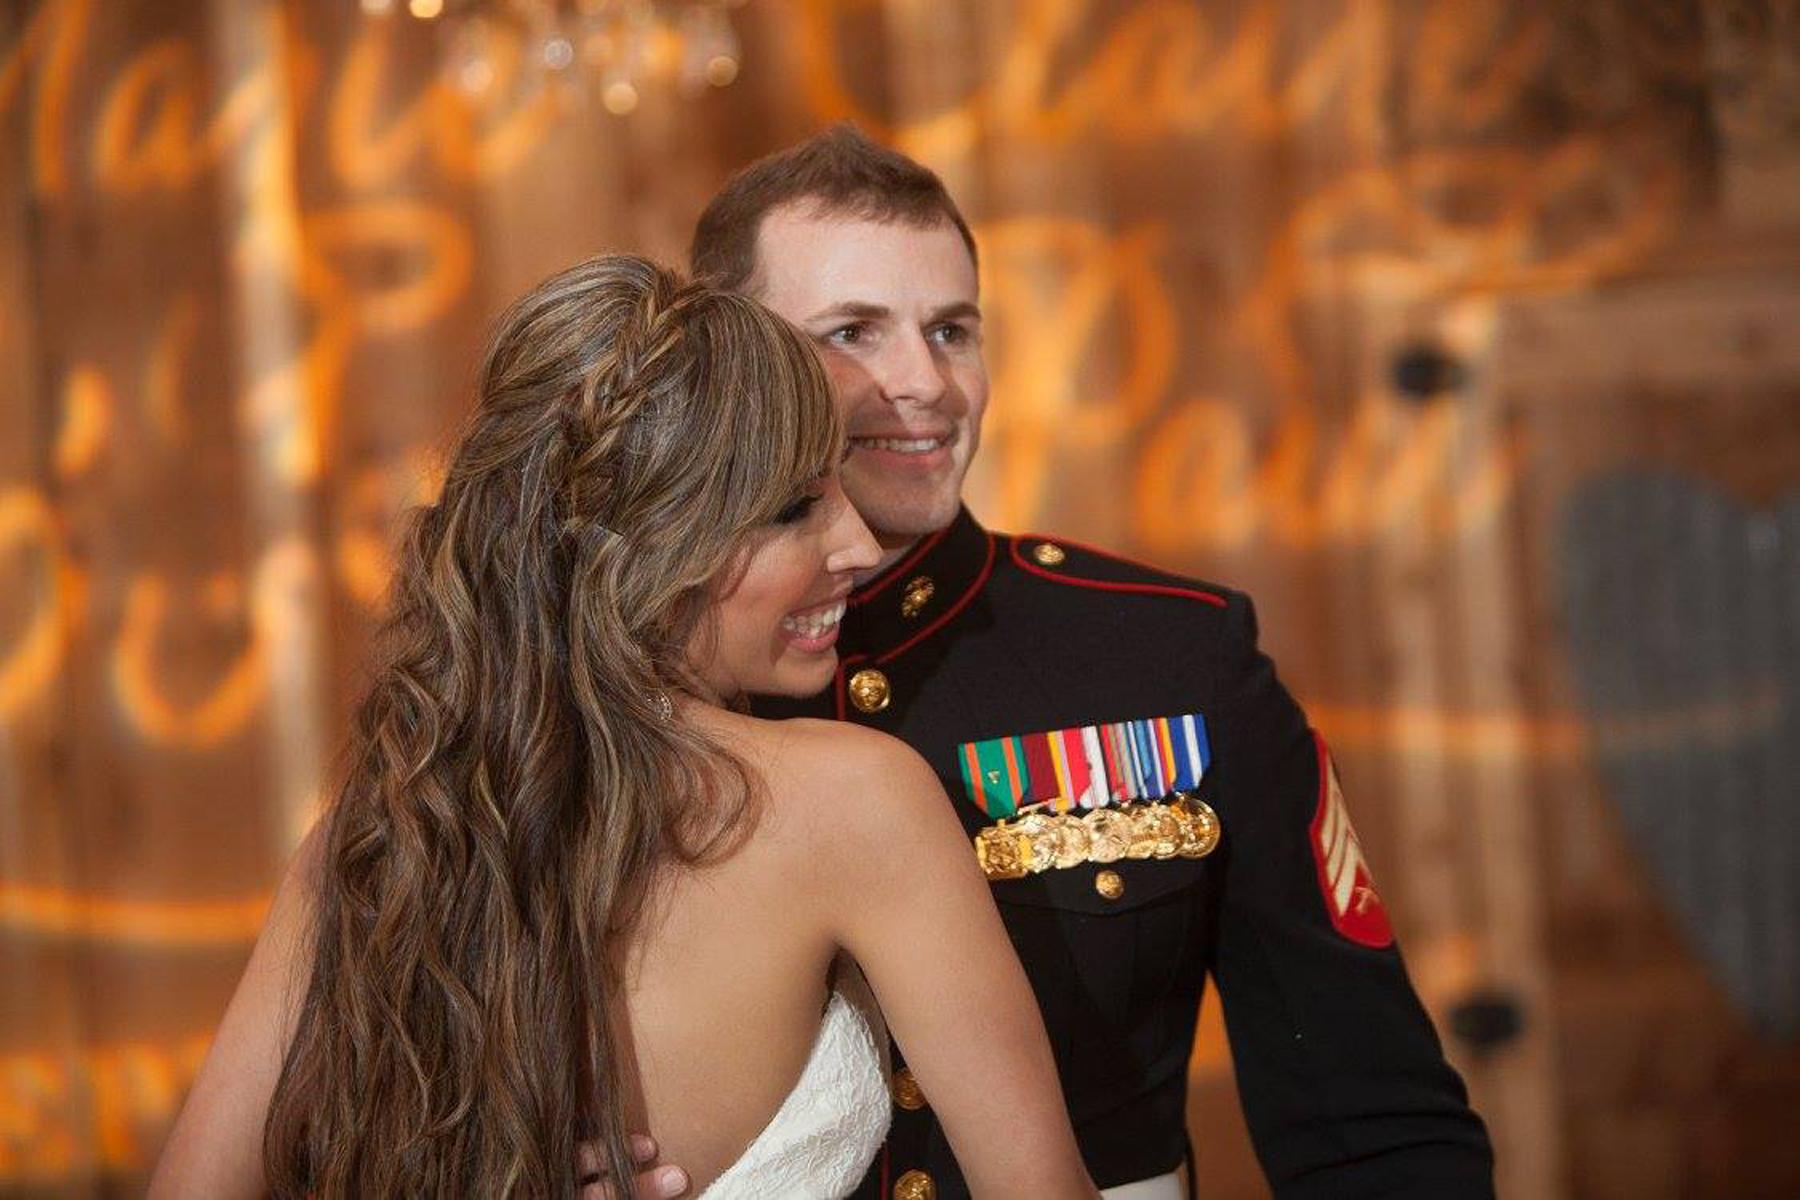 daytoremember.net | Leslie Cervantez Photography | Moffitt Oaks | A Day To Remember Houston Luxury Wedding Planning and Design